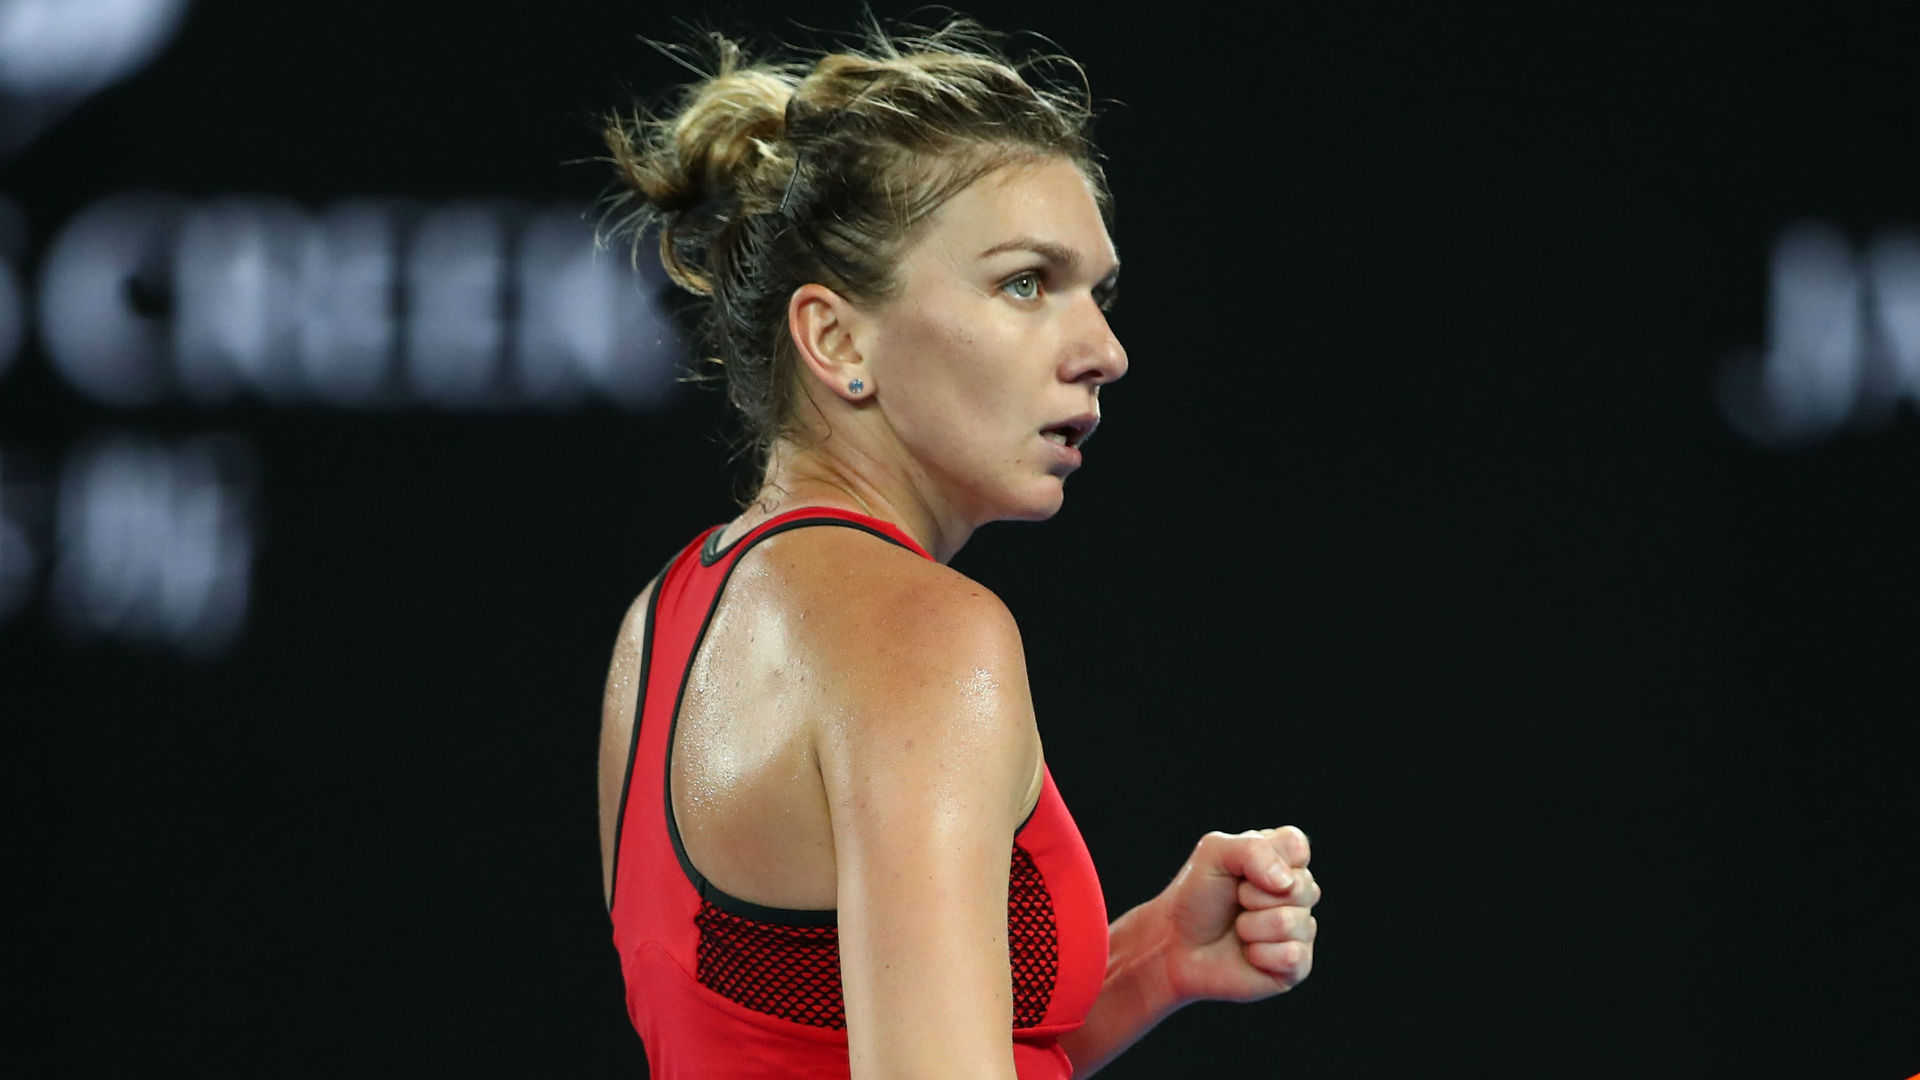 Halep wins on return, Wozniacki cruises